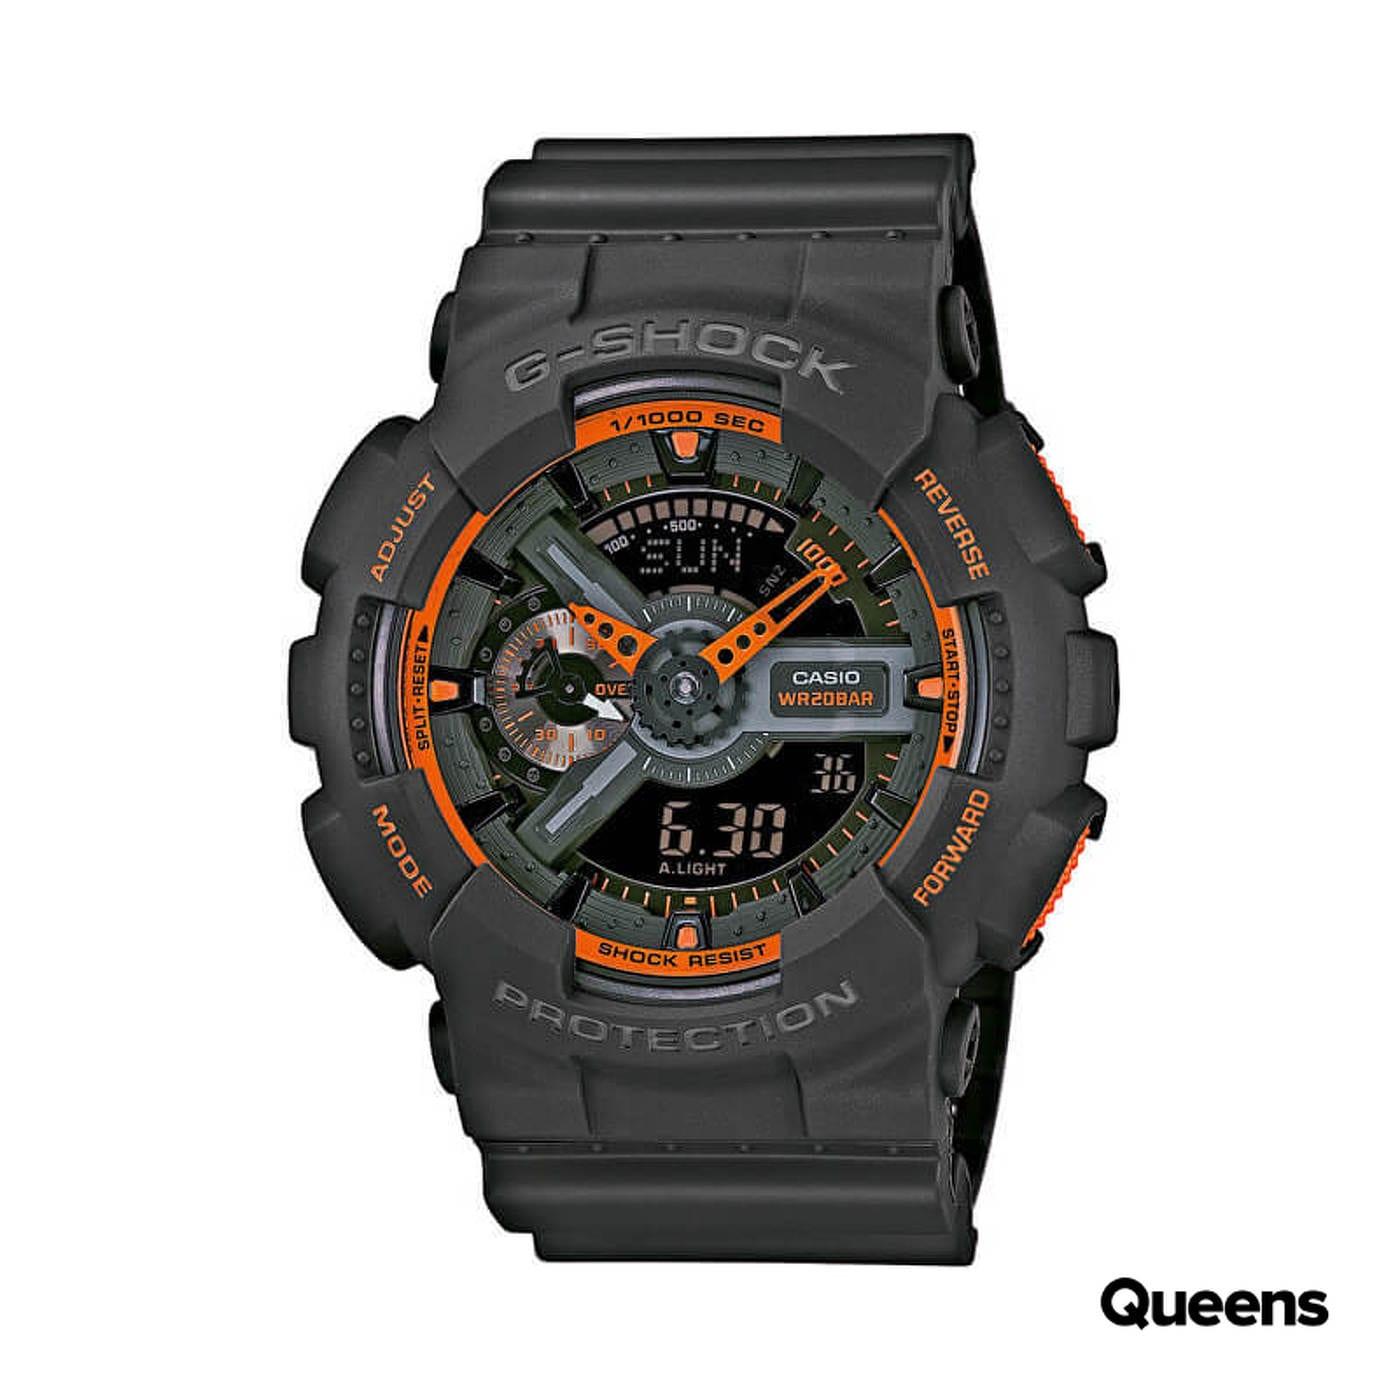 Casio G-Shock GA 110TS-1A4ER dunkelgrau